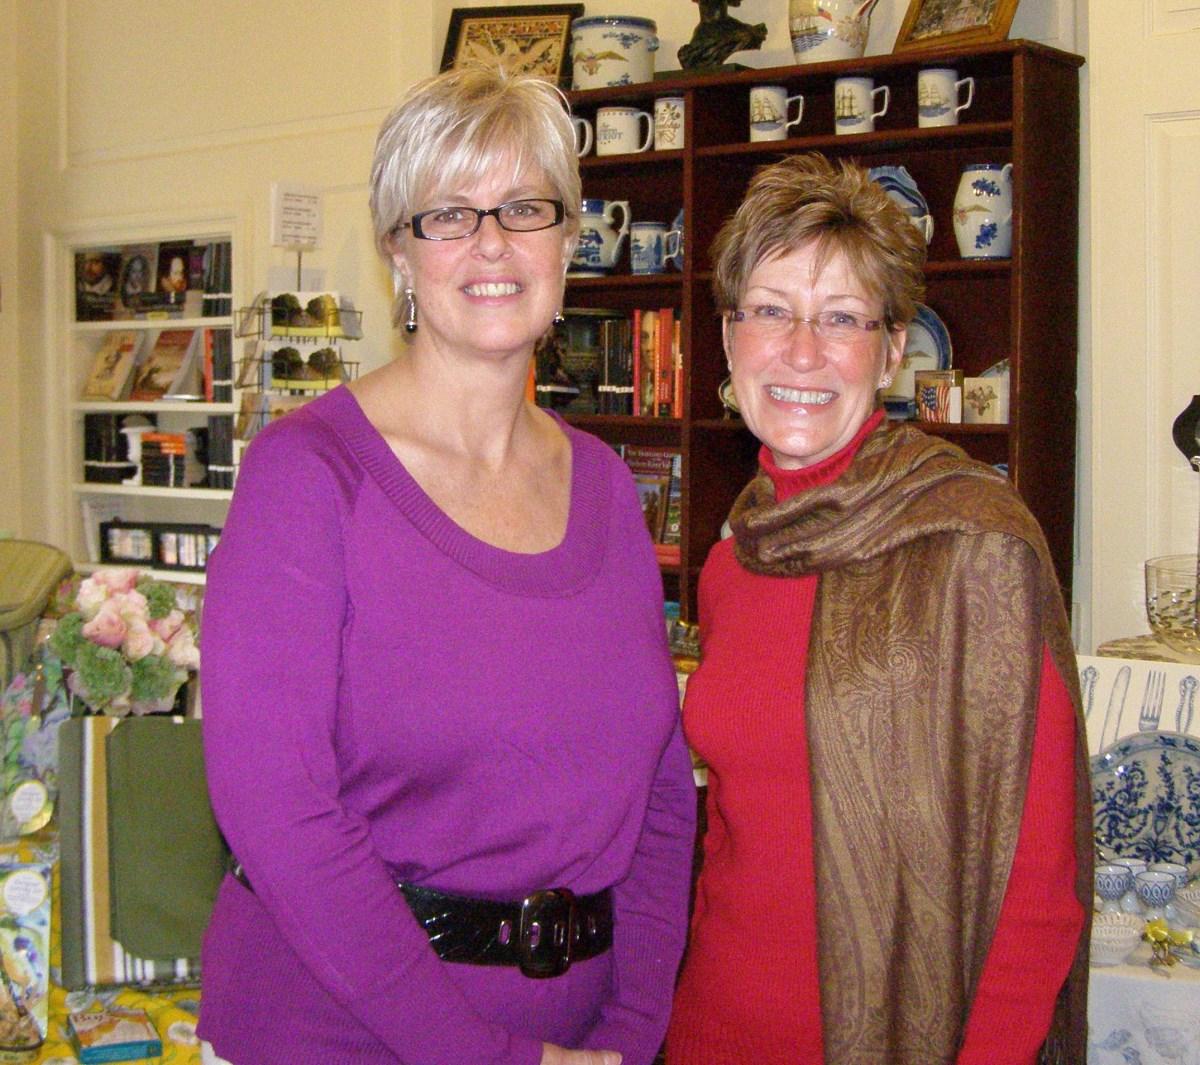 Executive Privilege Audiobook: Boscobel House And Gardens Refines Mission